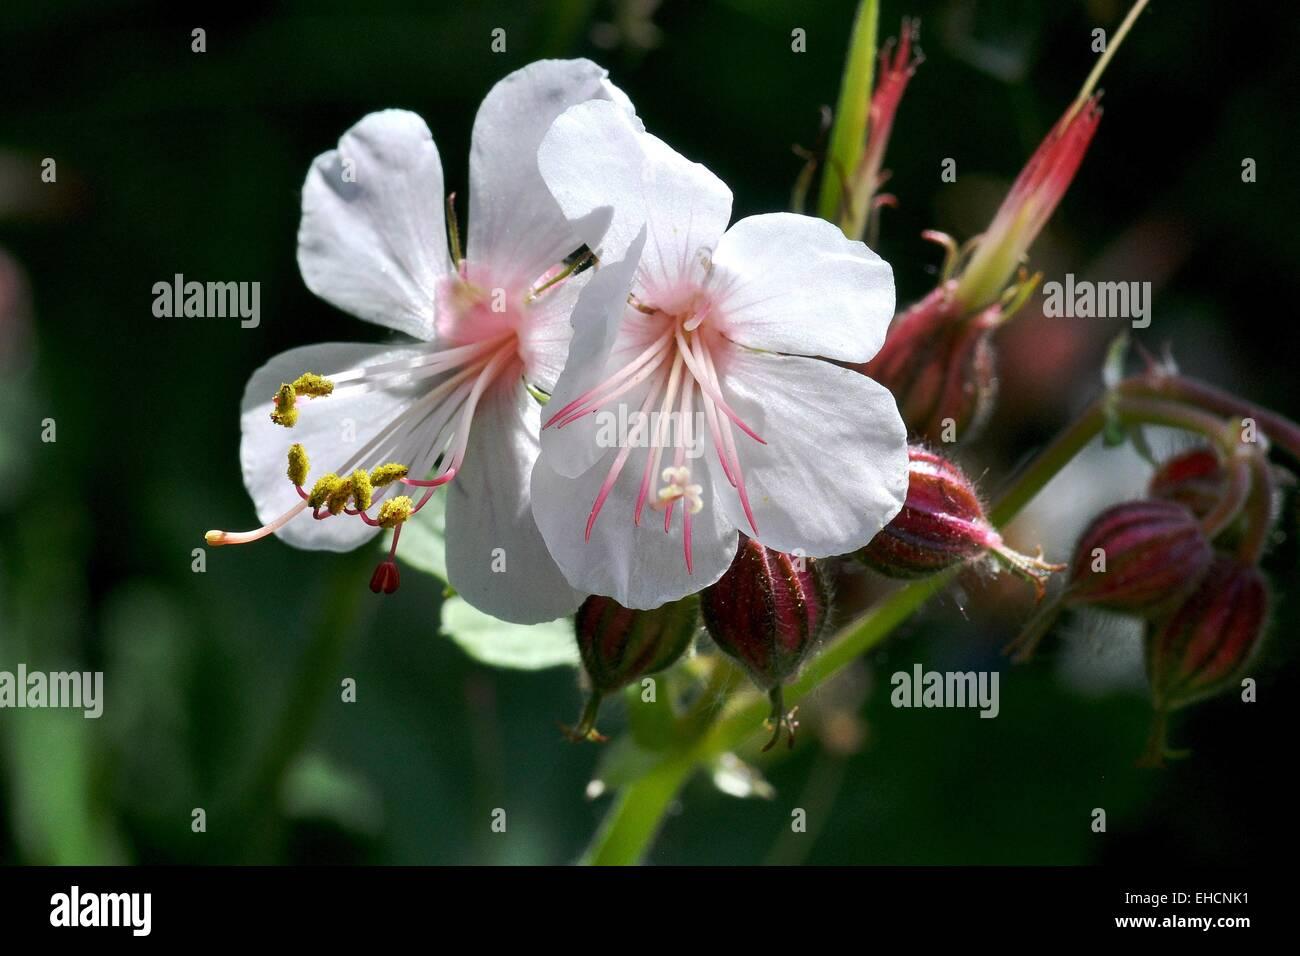 Storchschnabel, White blossom - Stock Image